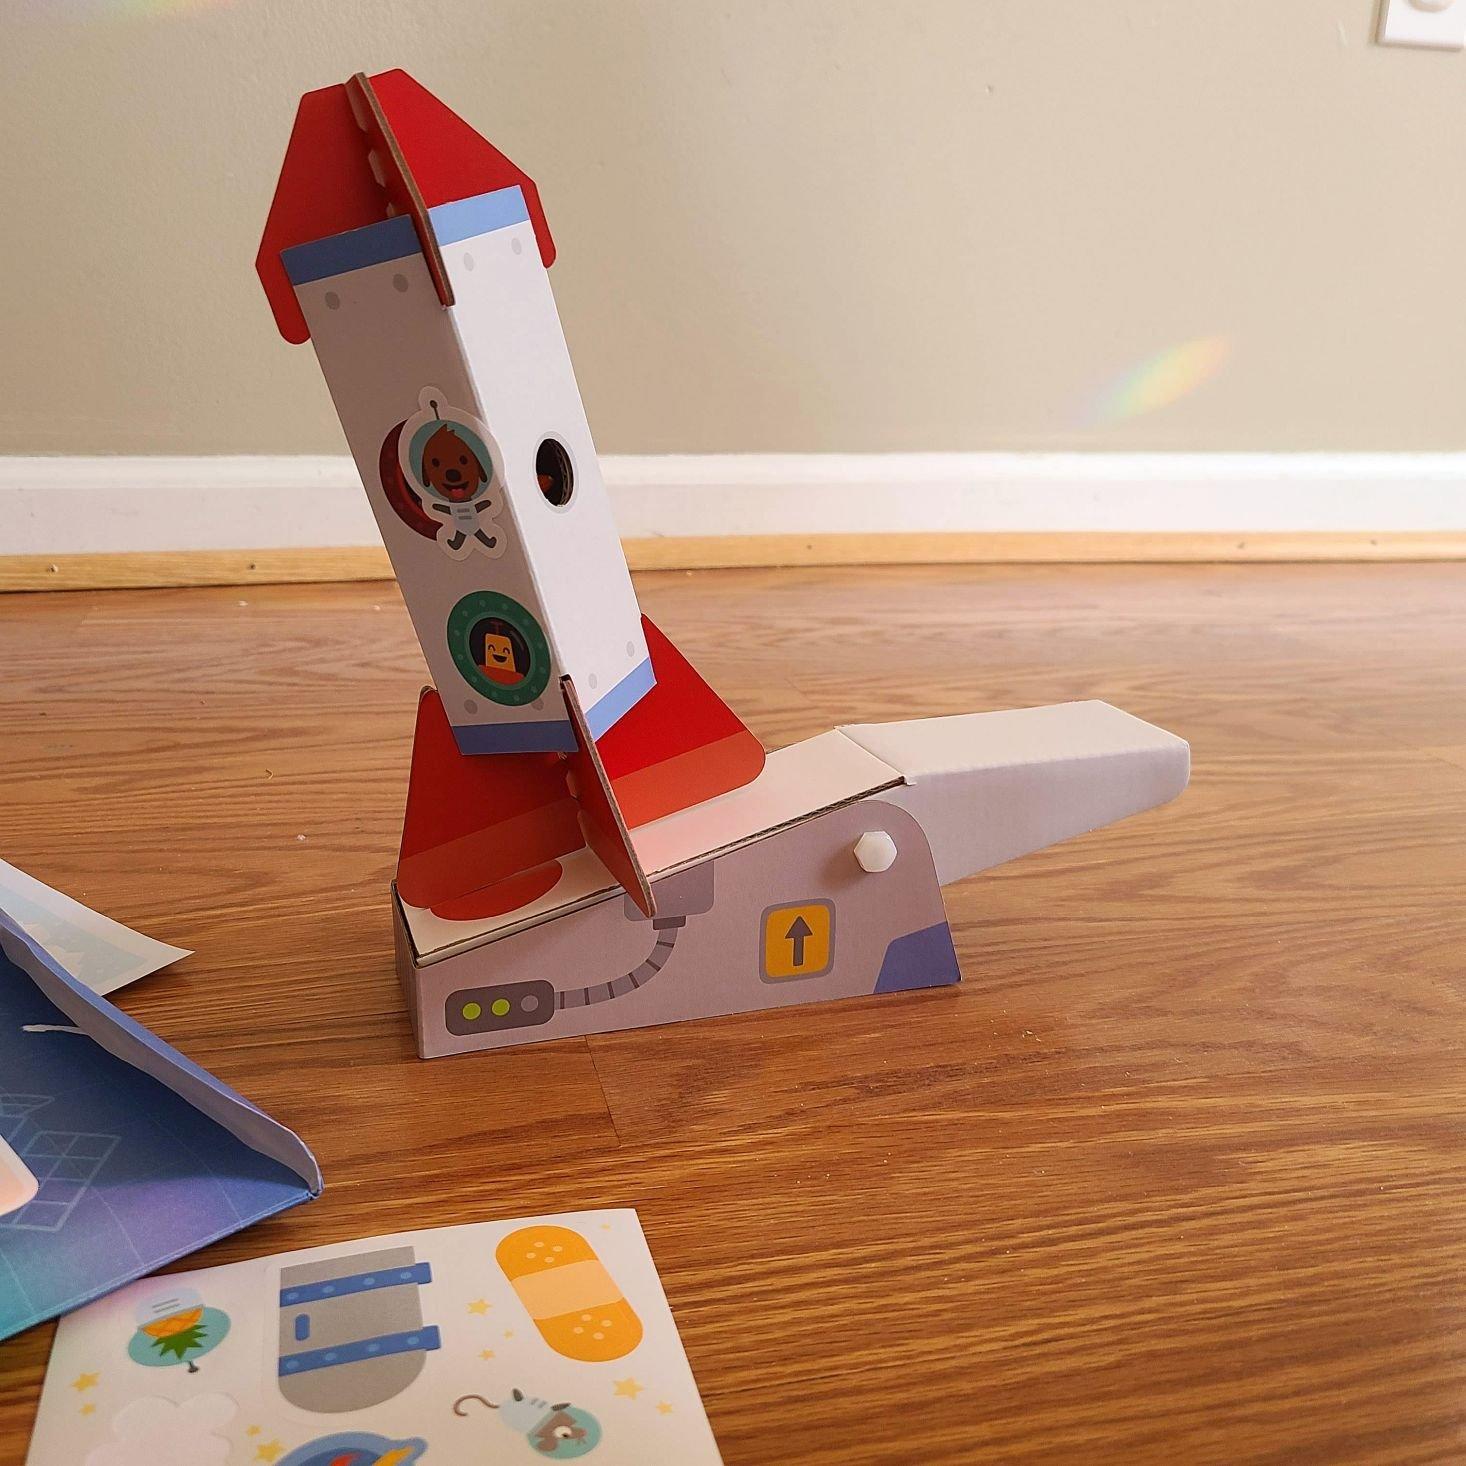 Sago Mini Box March 2021 rocket and launch pad assembled